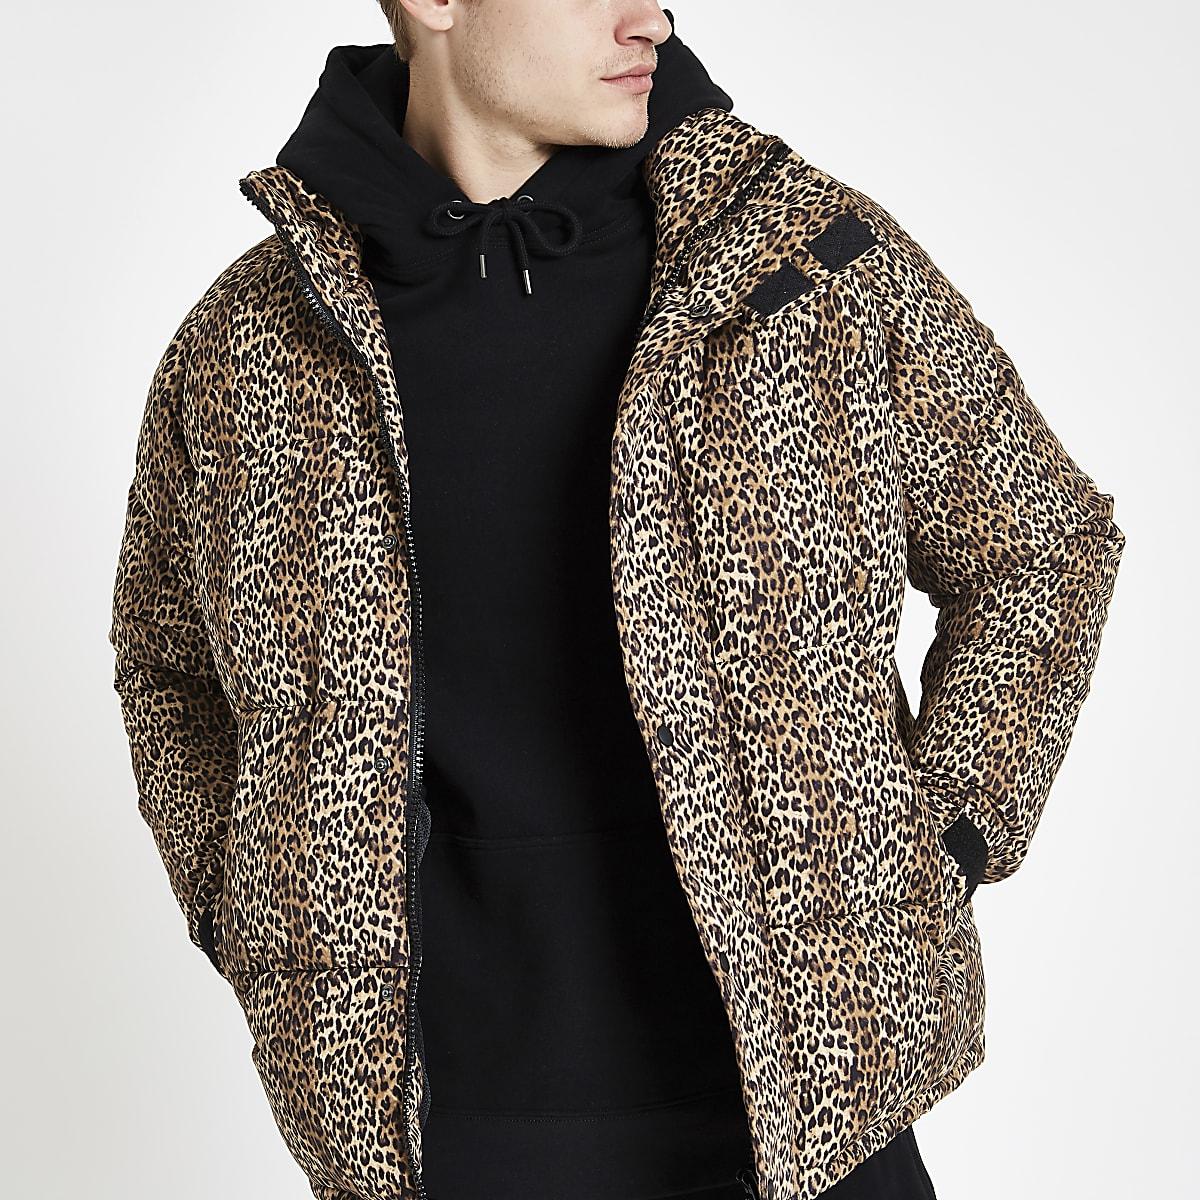 35033239f1 Brown leopard print puffer jacket - Jackets - Coats & Jackets - men